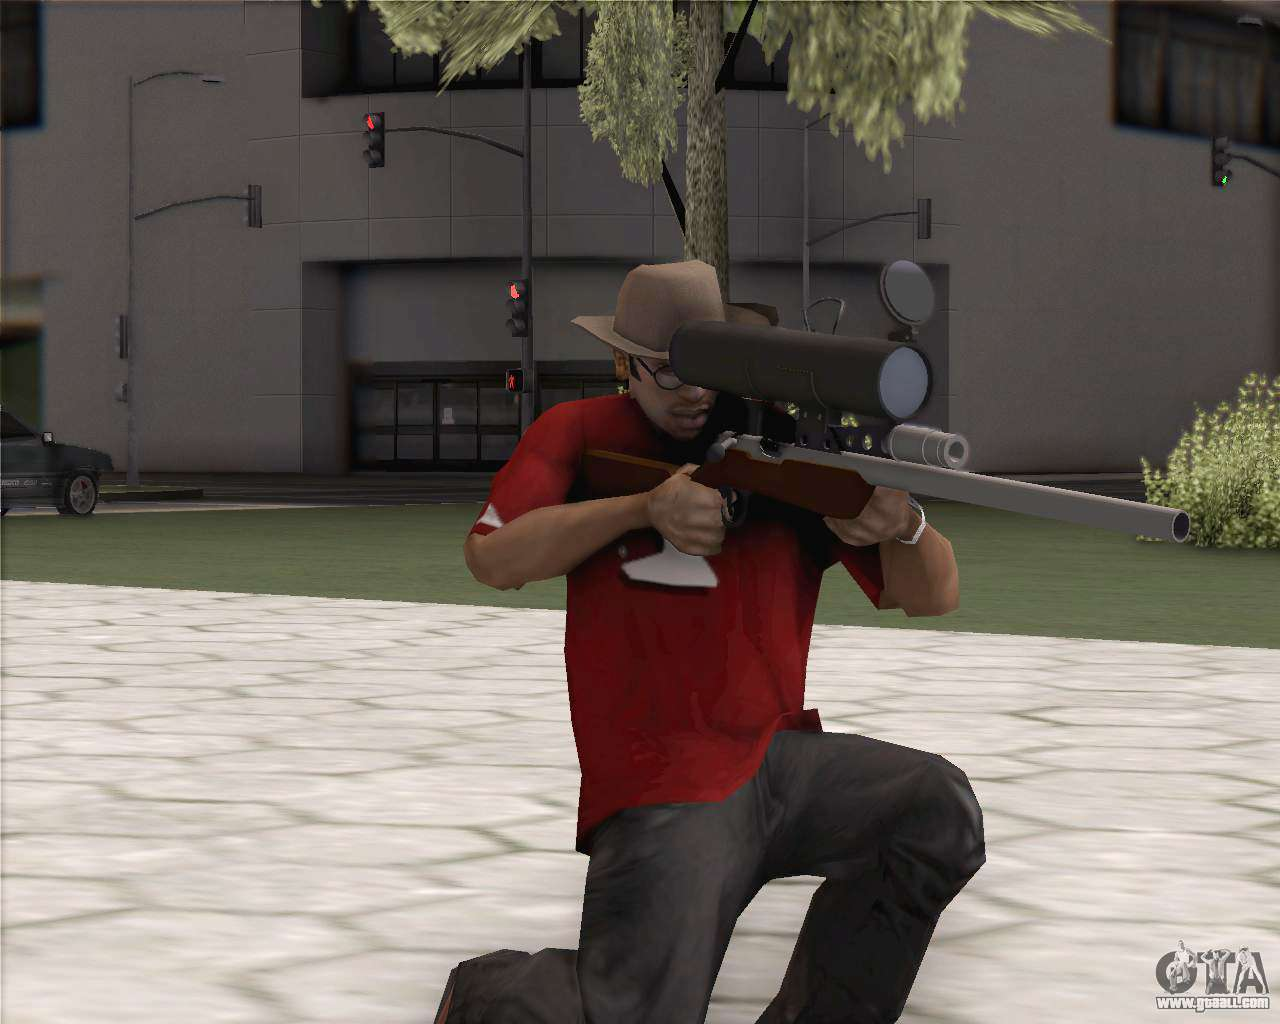 Tf2 Sniper Rifle For Gta San Andreas